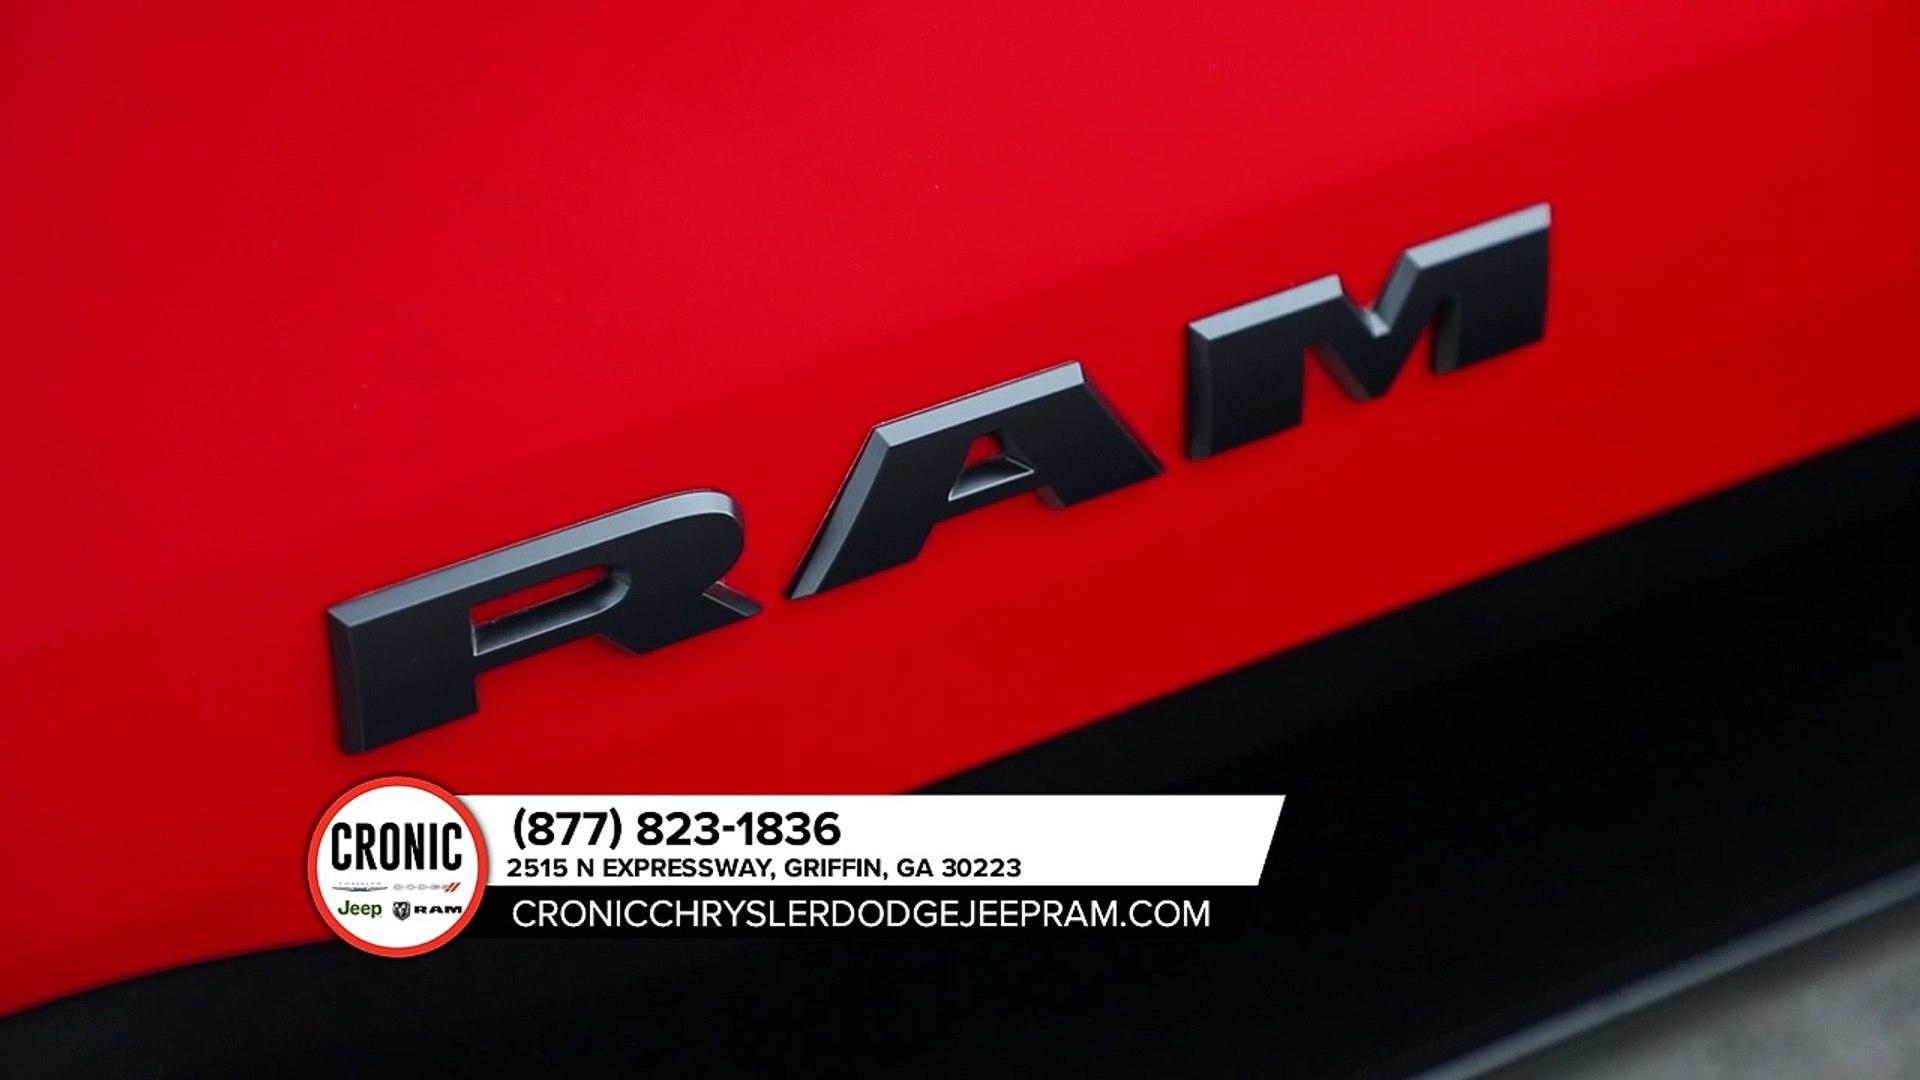 New 2020  Ram  1500  Jackson  GA  | 2020  Ram  1500 sales  GA